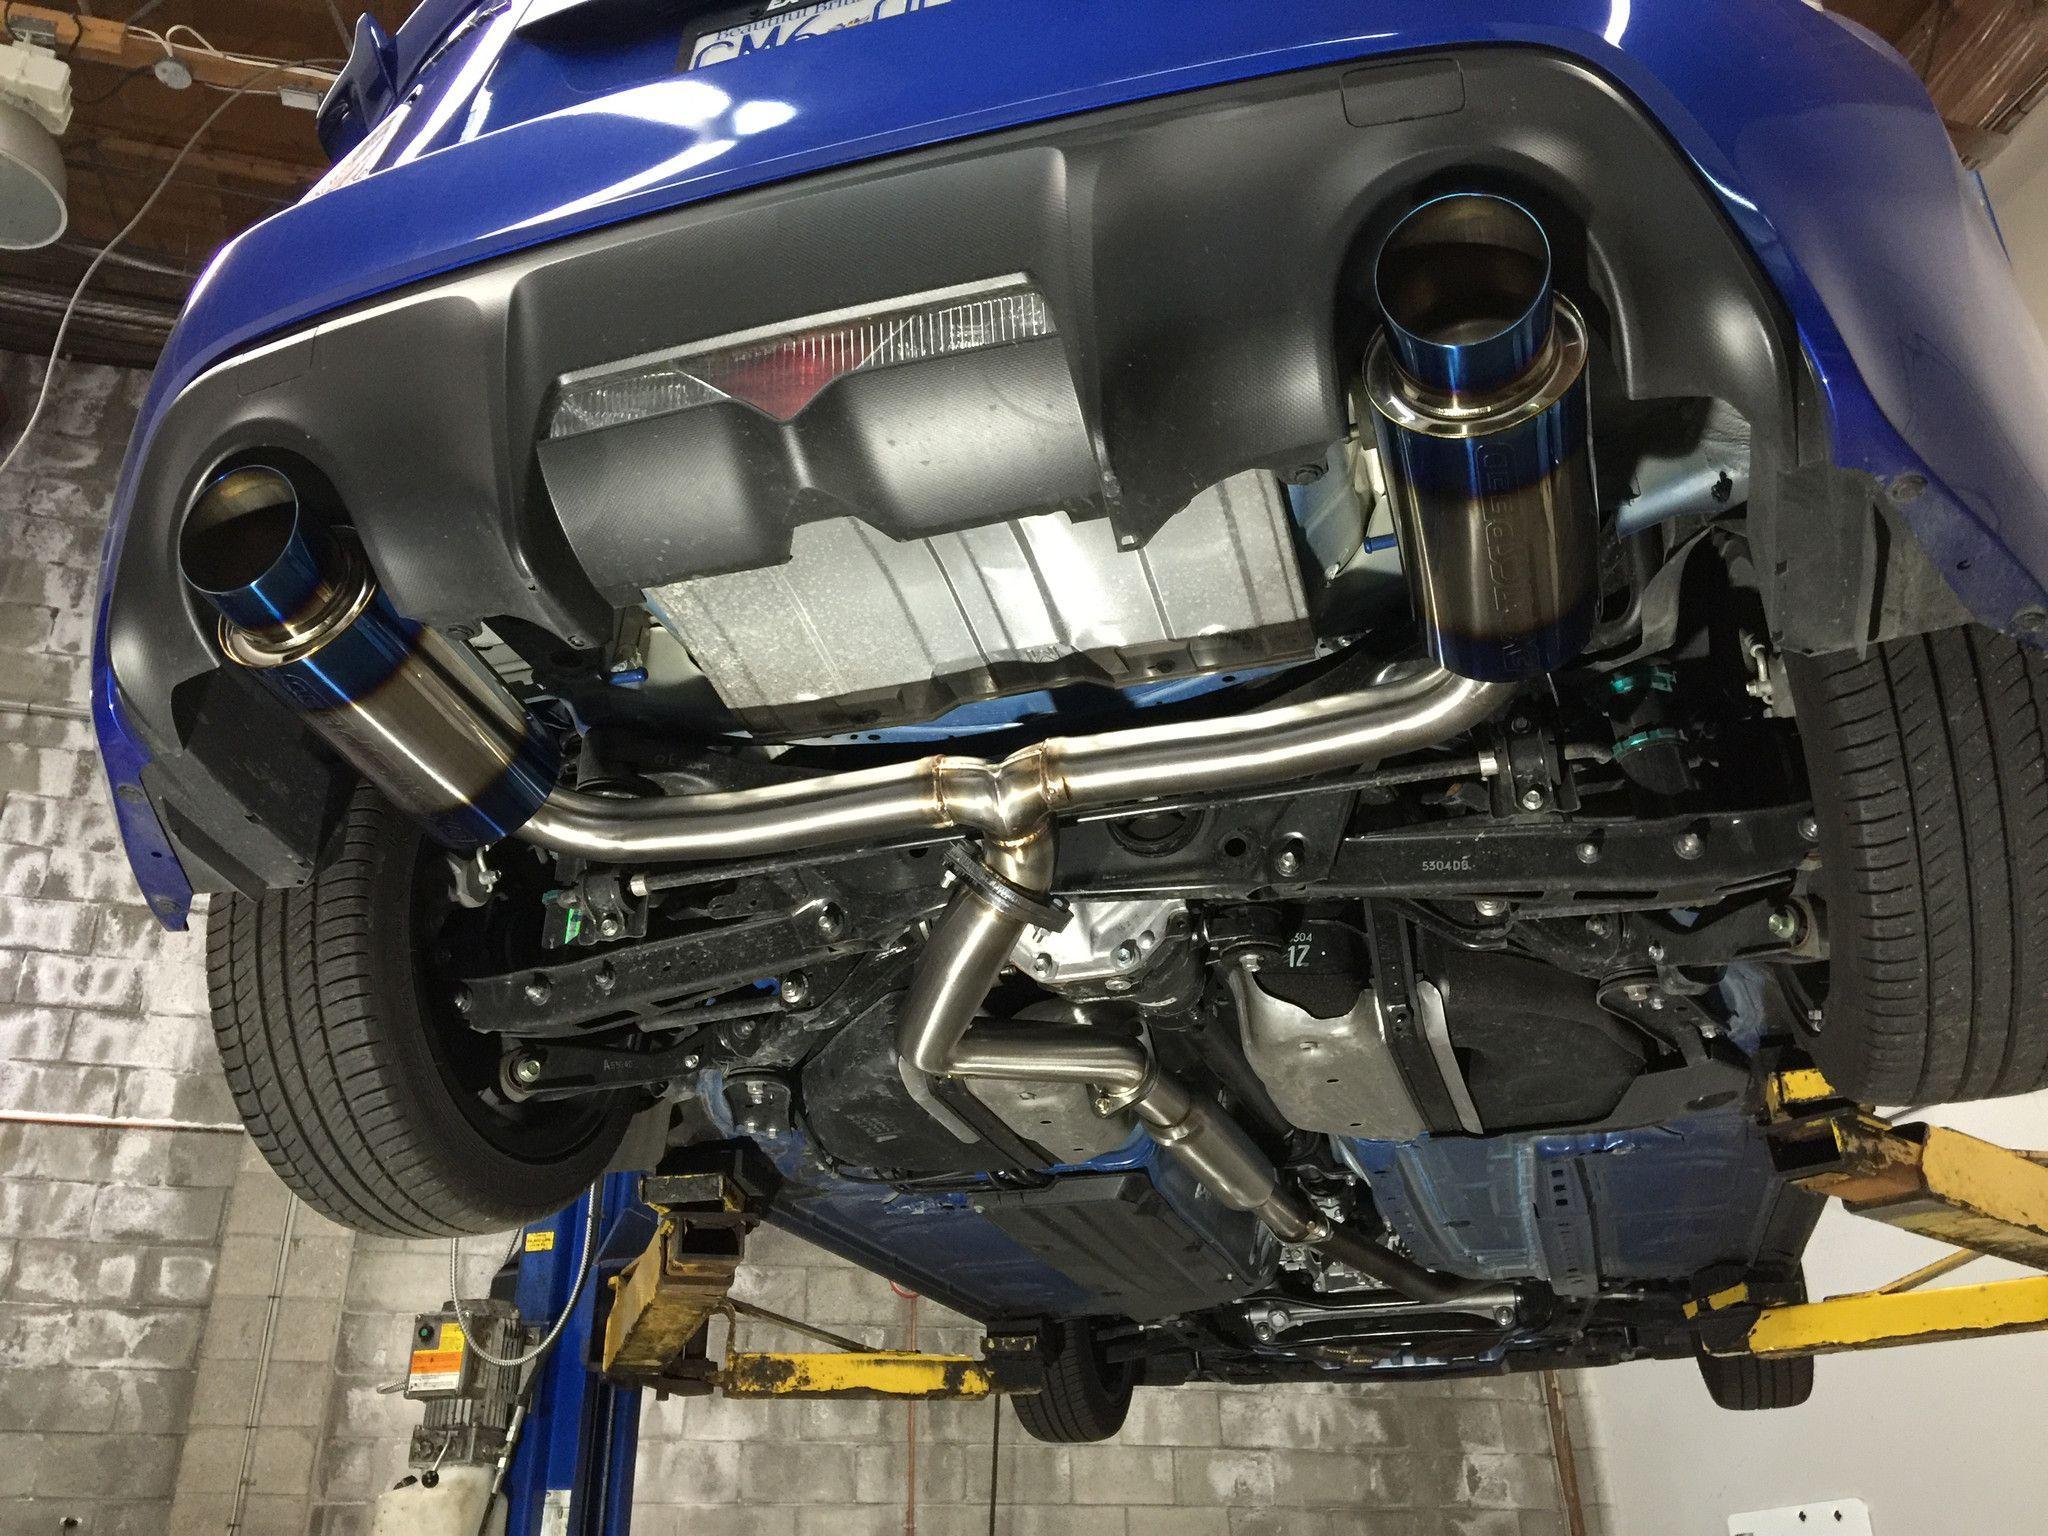 R1 t exhaust scion frs subaru brz 2013 on